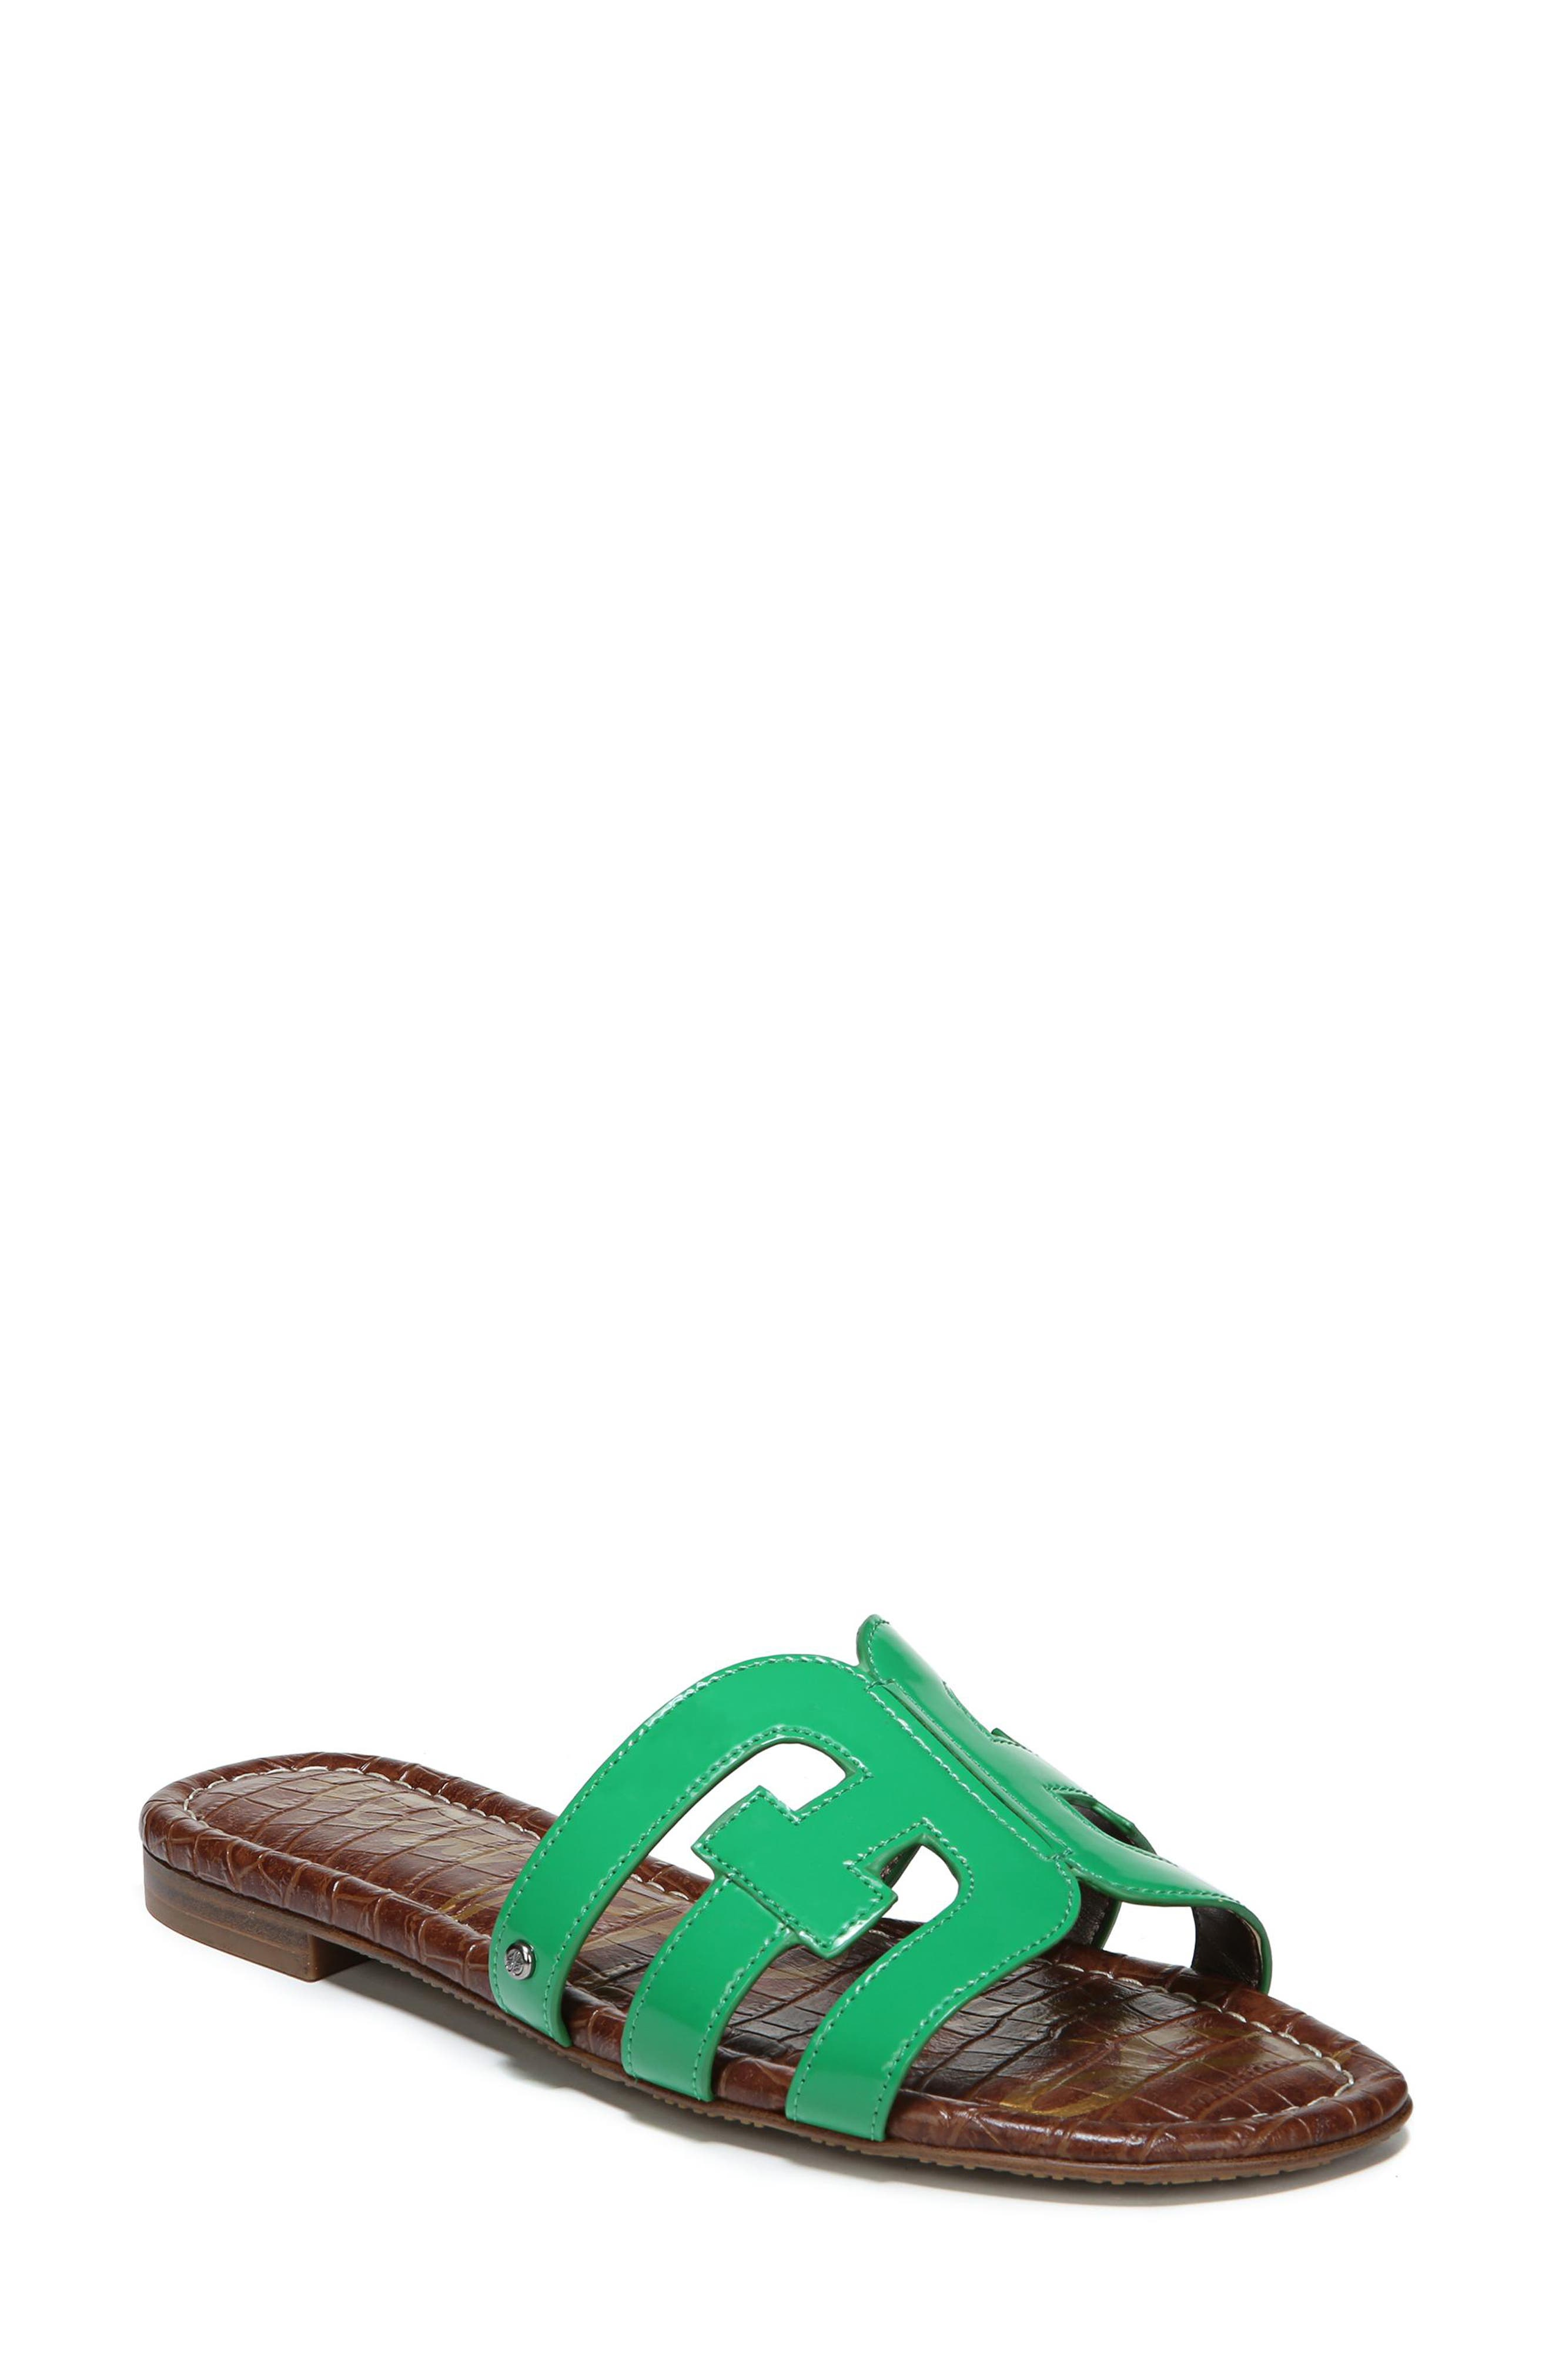 Bay Cutout Slide Sandal,                             Alternate thumbnail 6, color,                             LEAF GREEN PATENT LEATHER